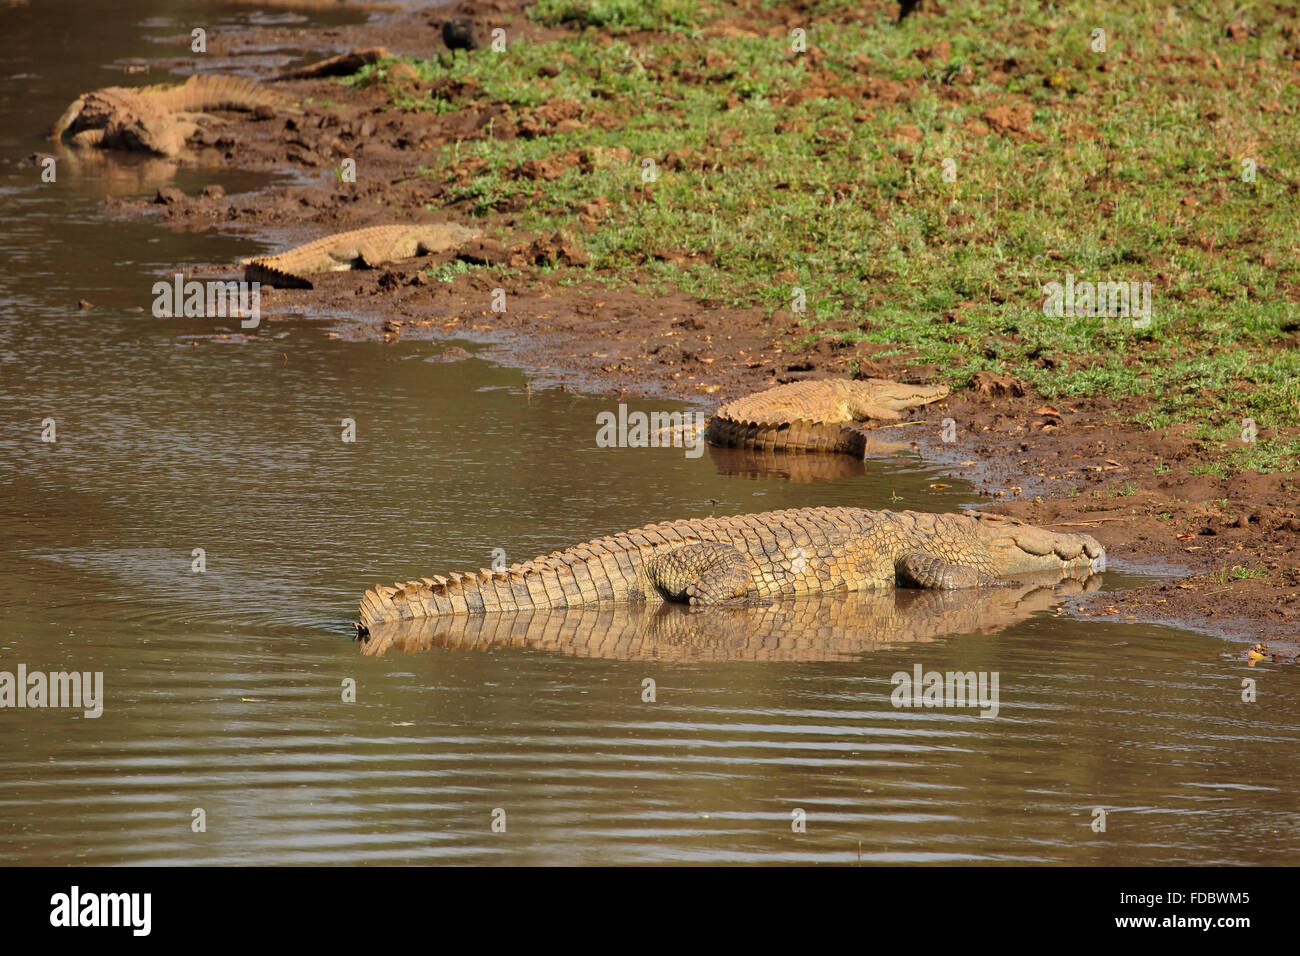 Nile crocodiles (Crocodylus niloticus) basking, Kruger National Park, South Africa - Stock Image